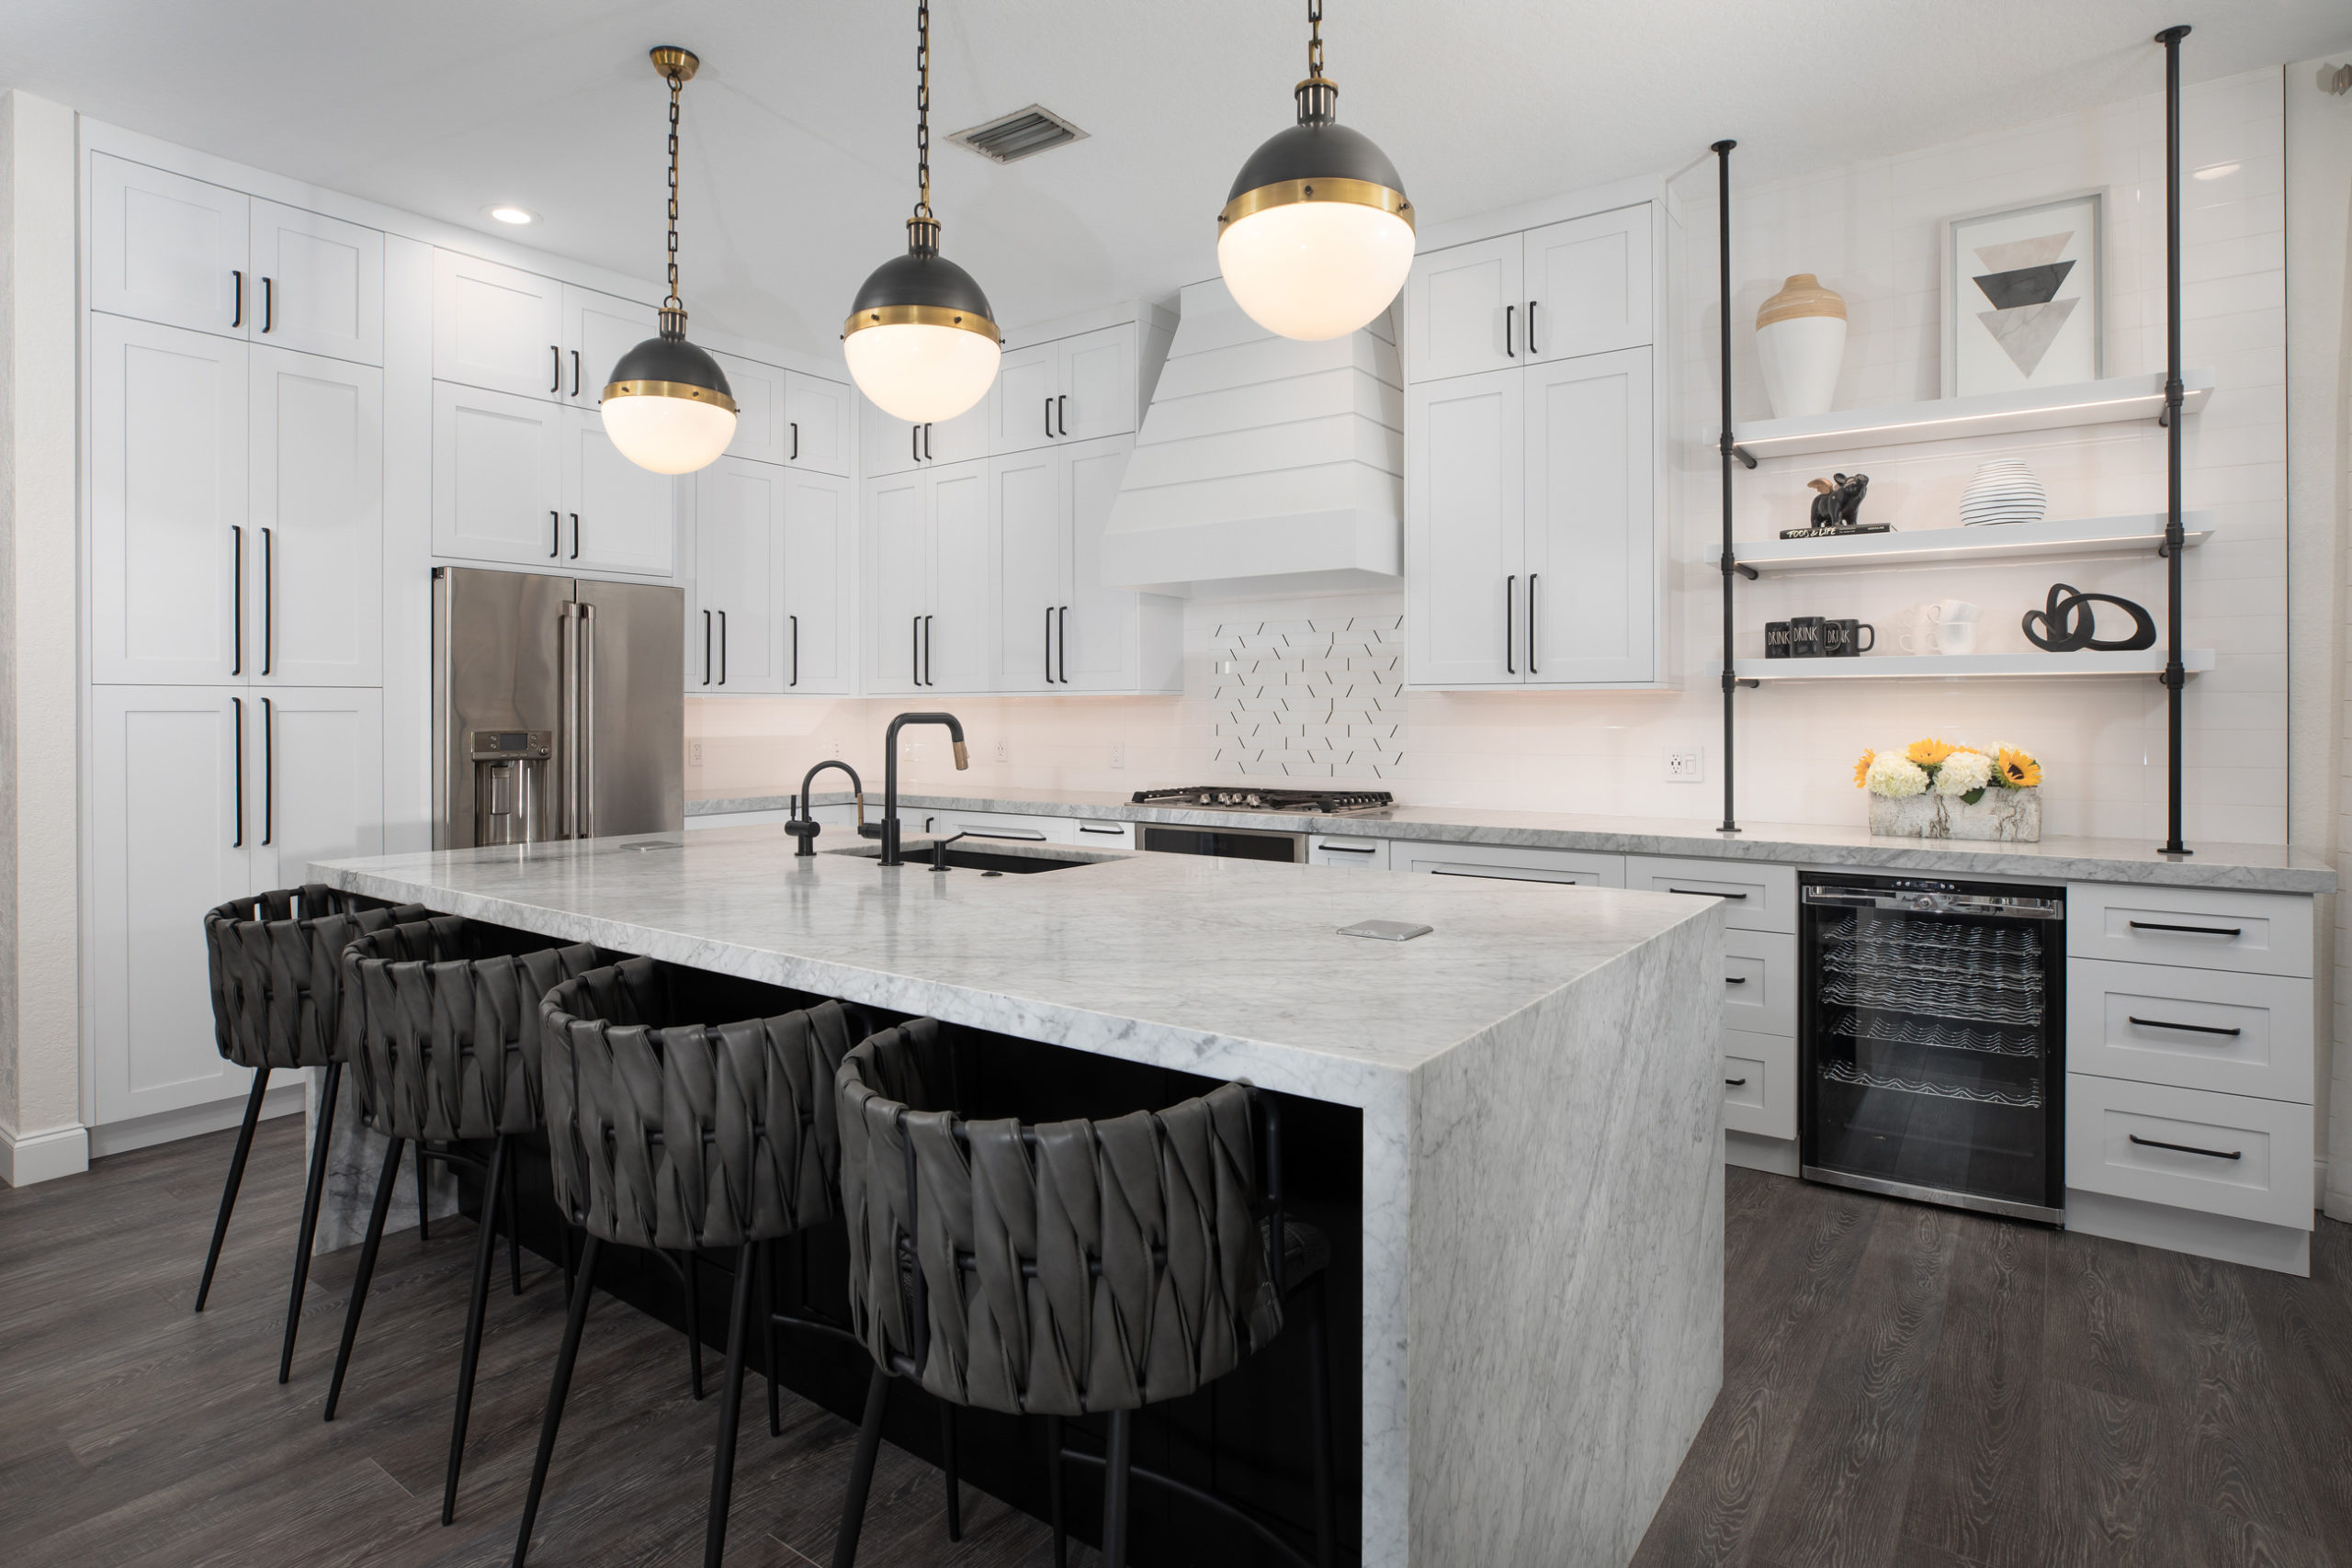 Honed Paragraph Kitchen Scaled, Primestones® Granite, Quartz, Marble